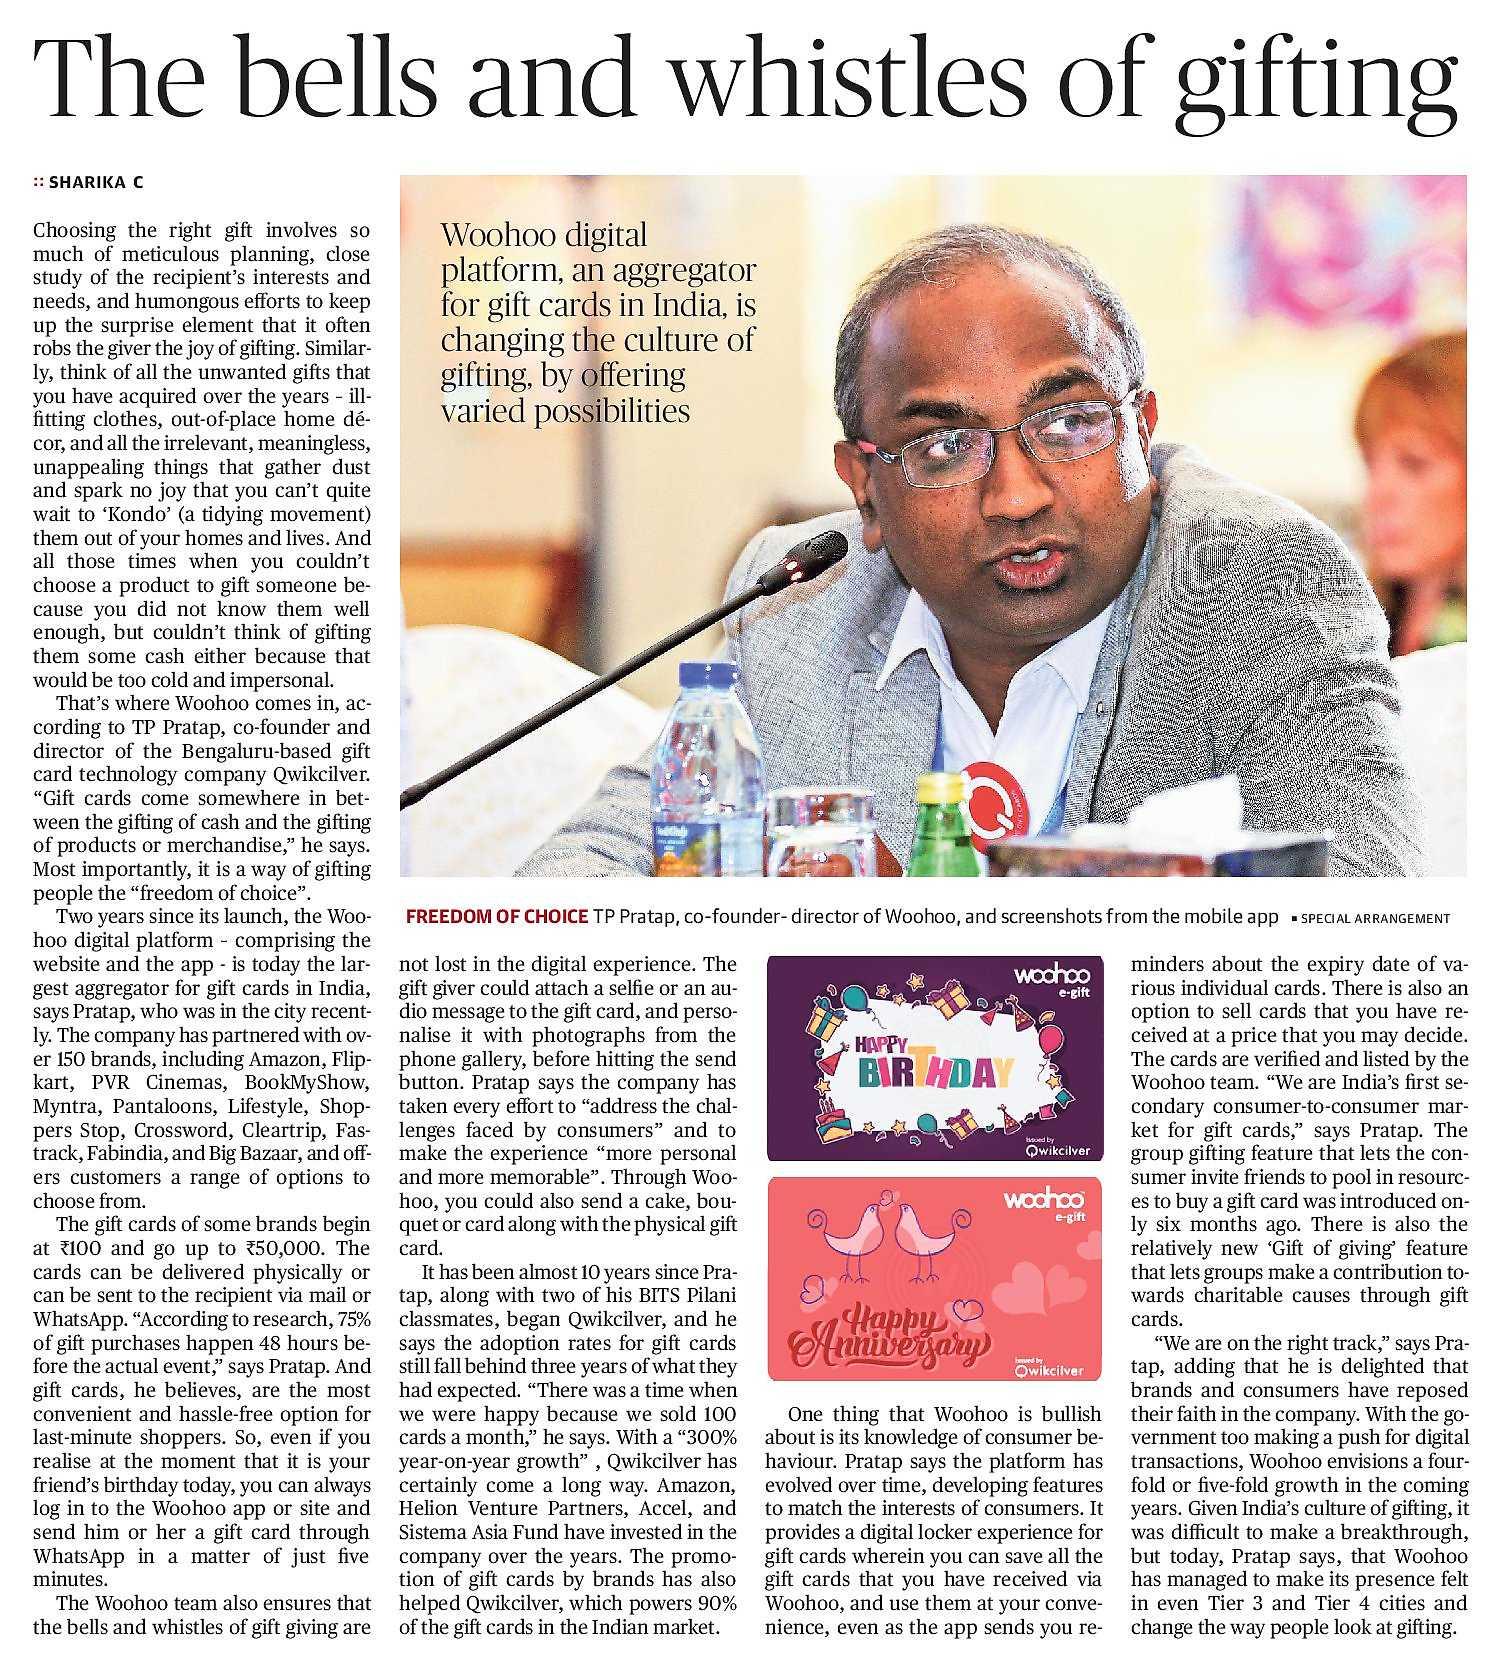 Woohoo, The Hindu Metroplus, March 12, 2018